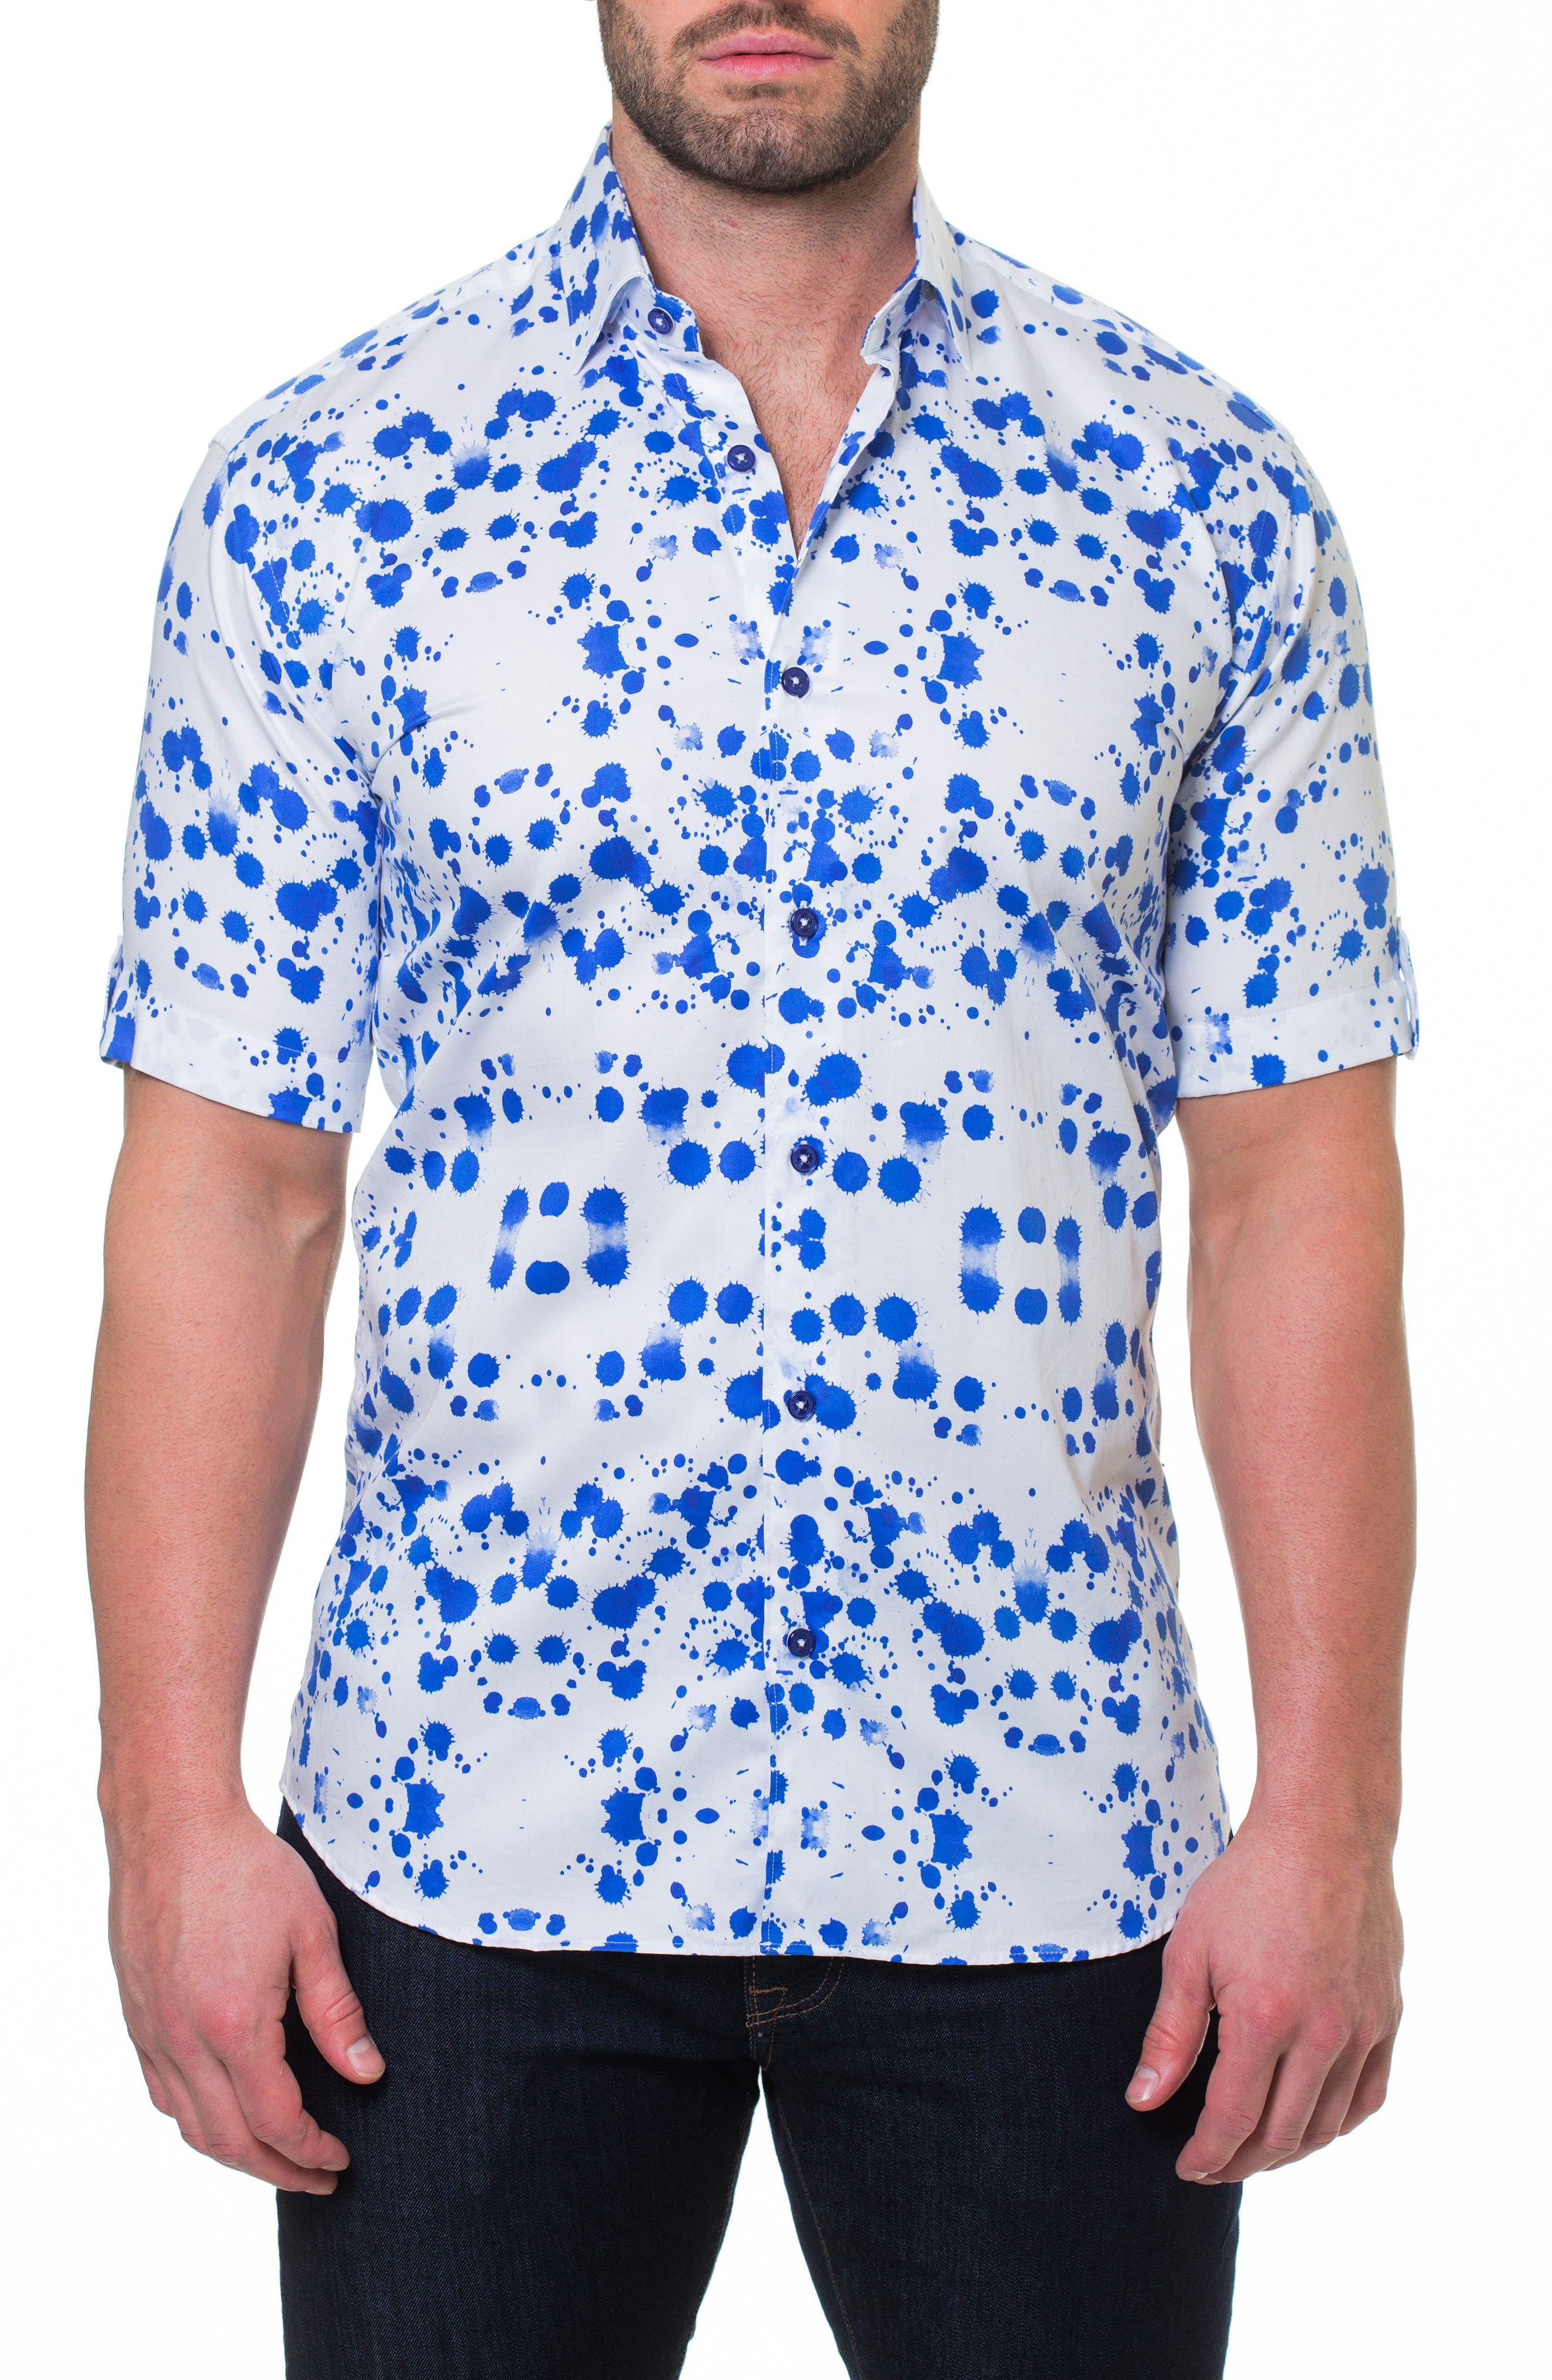 Maceoo Fresh Drop Sport Shirt